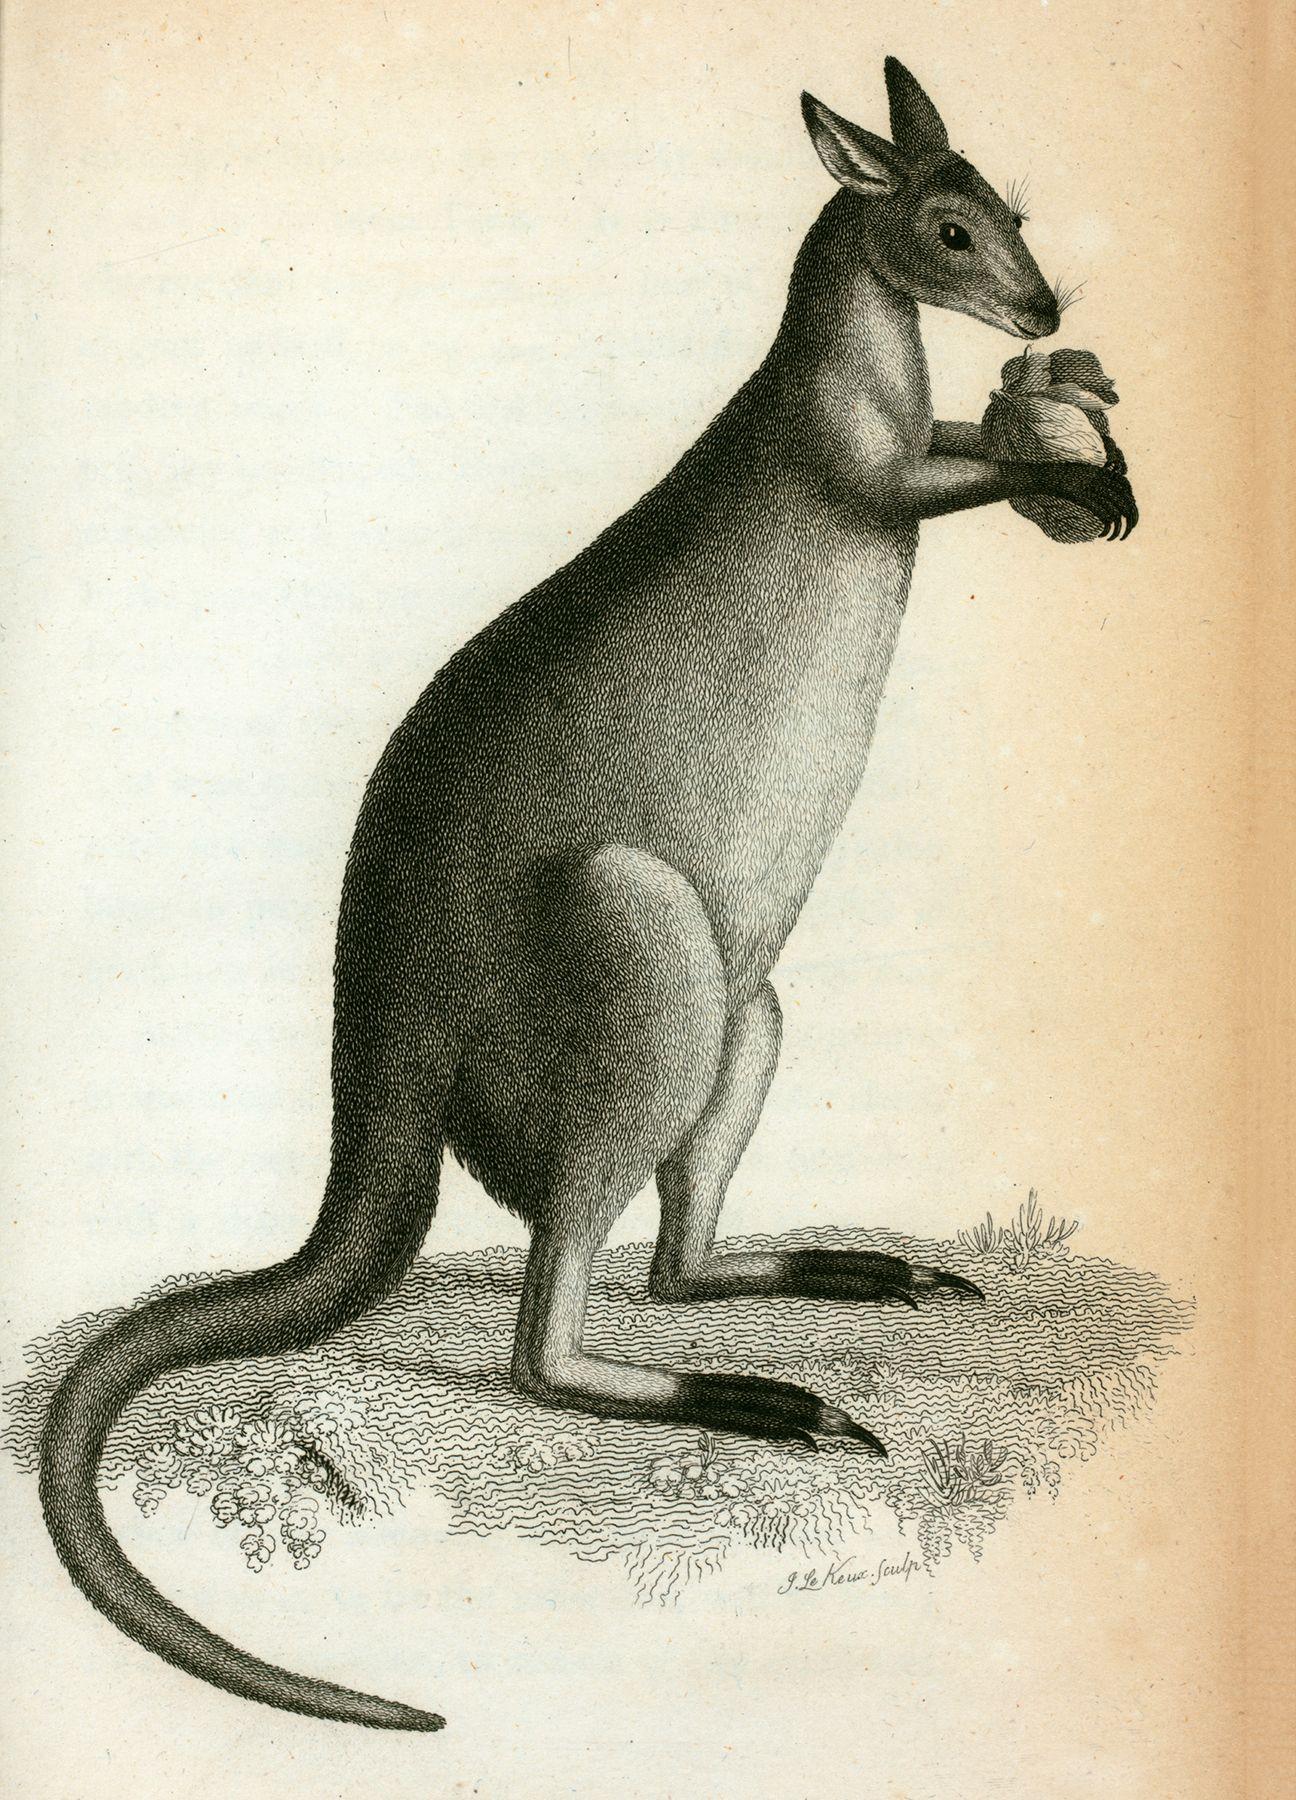 Vintage Natural History Kangaroo Image